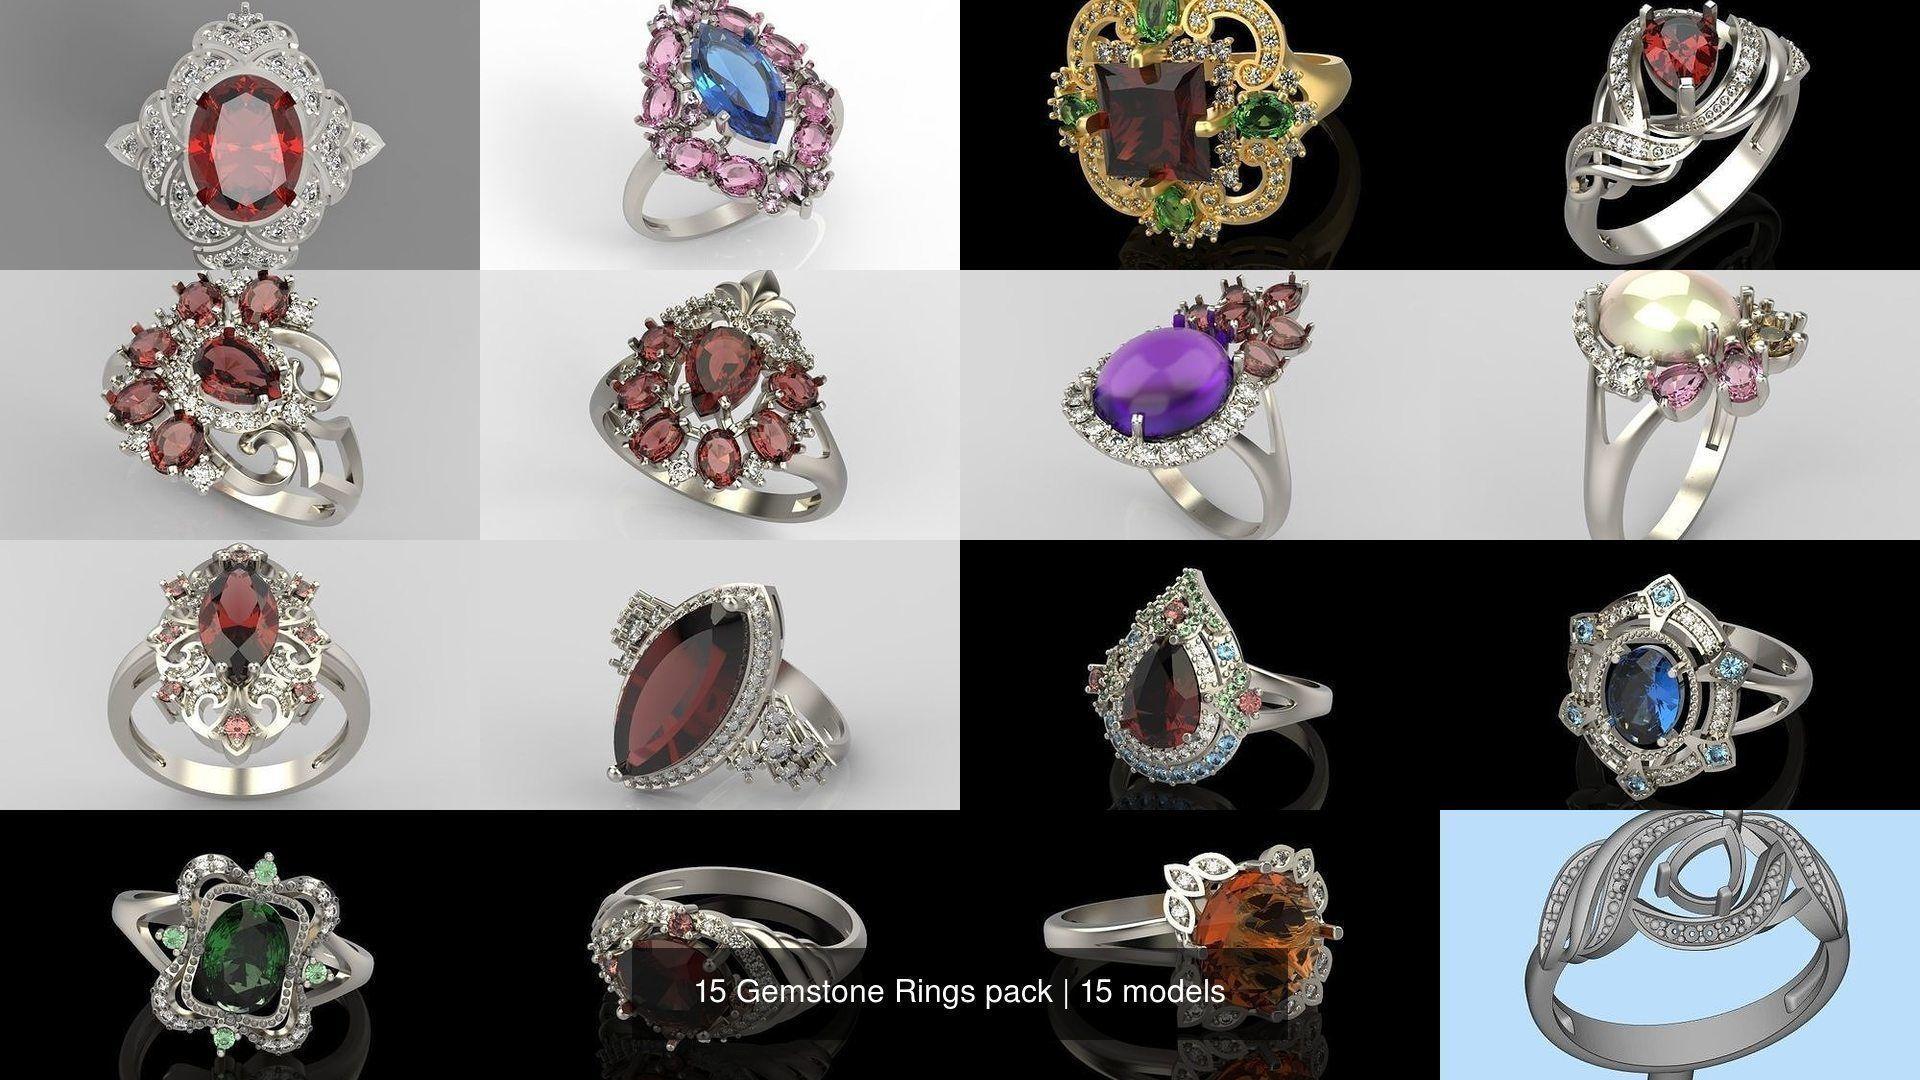 15 Women Gemstone Rings pack 3dm stl 3D print model